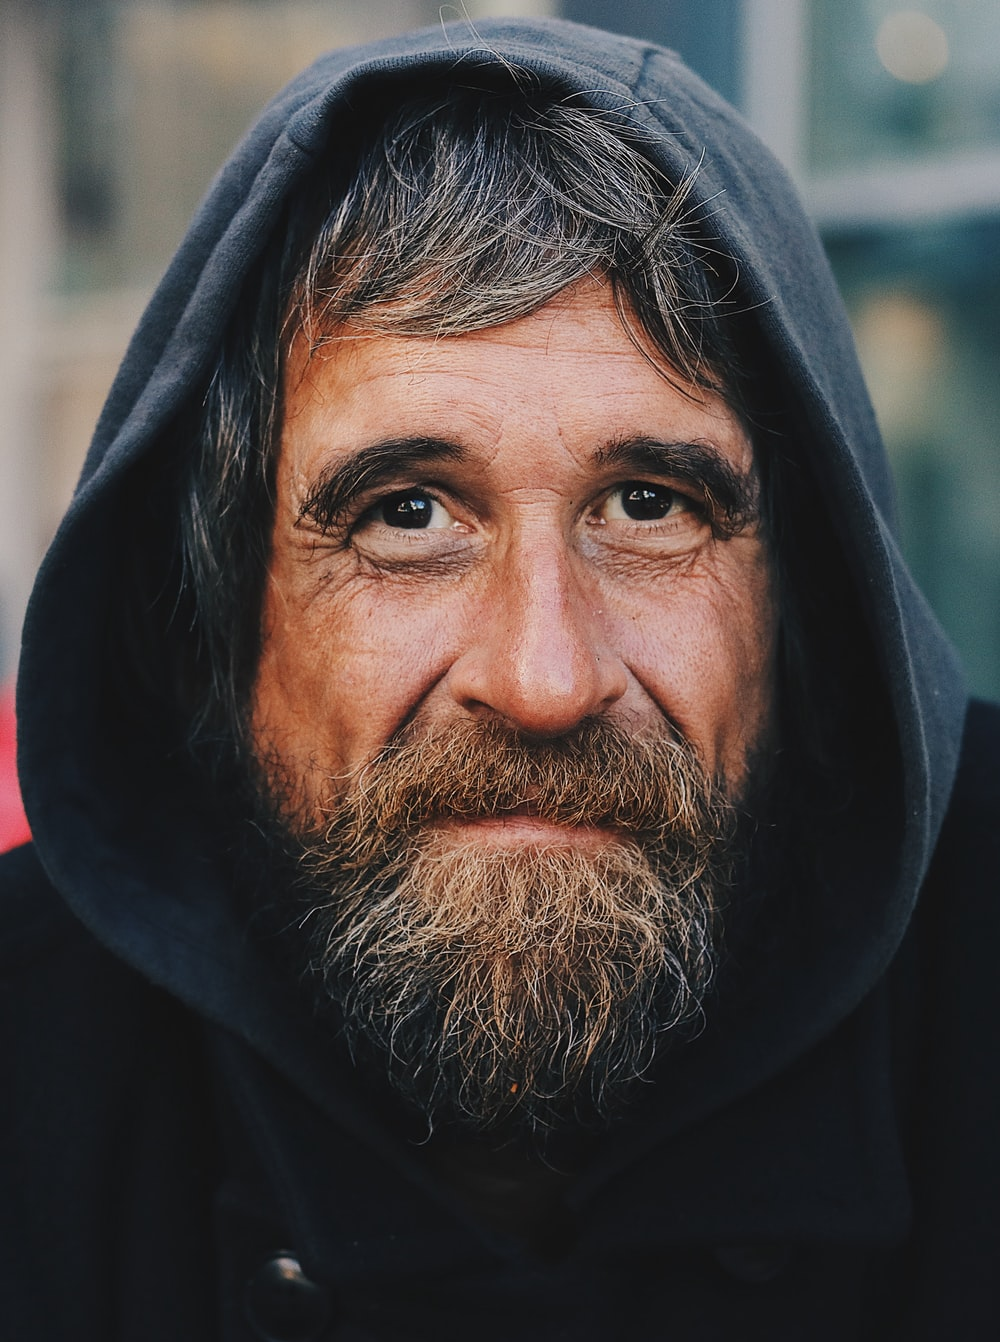 portrait photo of a man wearing hoodie